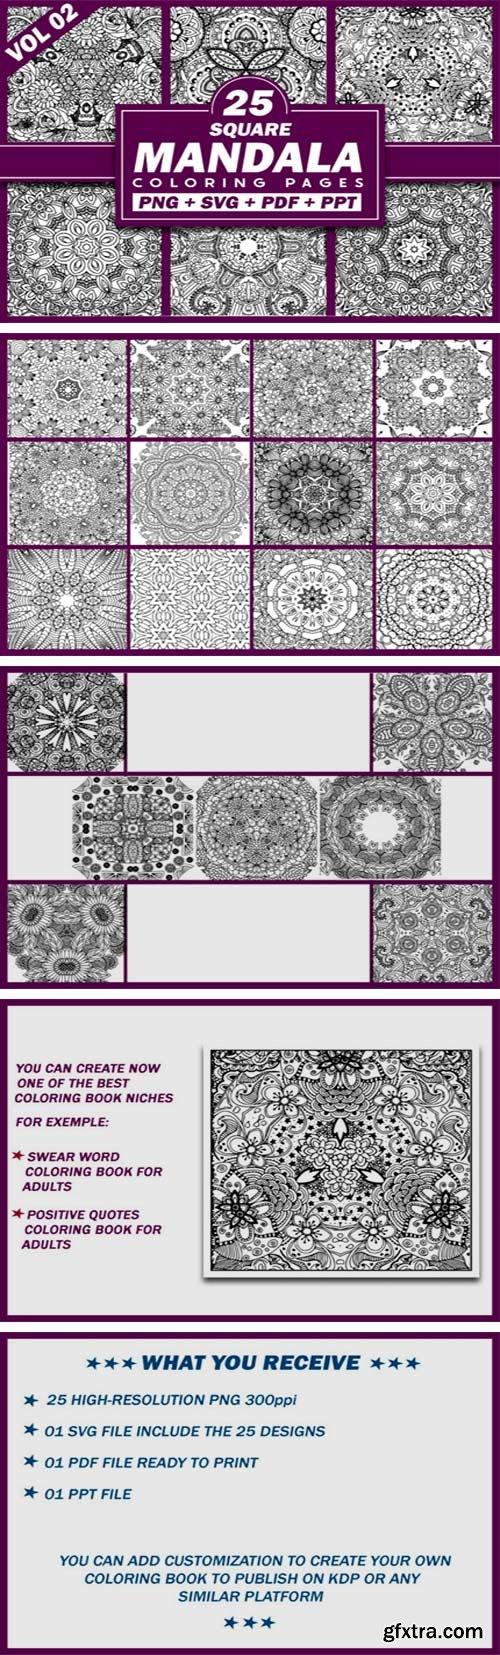 25 Square Mandala Coloring Pages | KDP 5576317